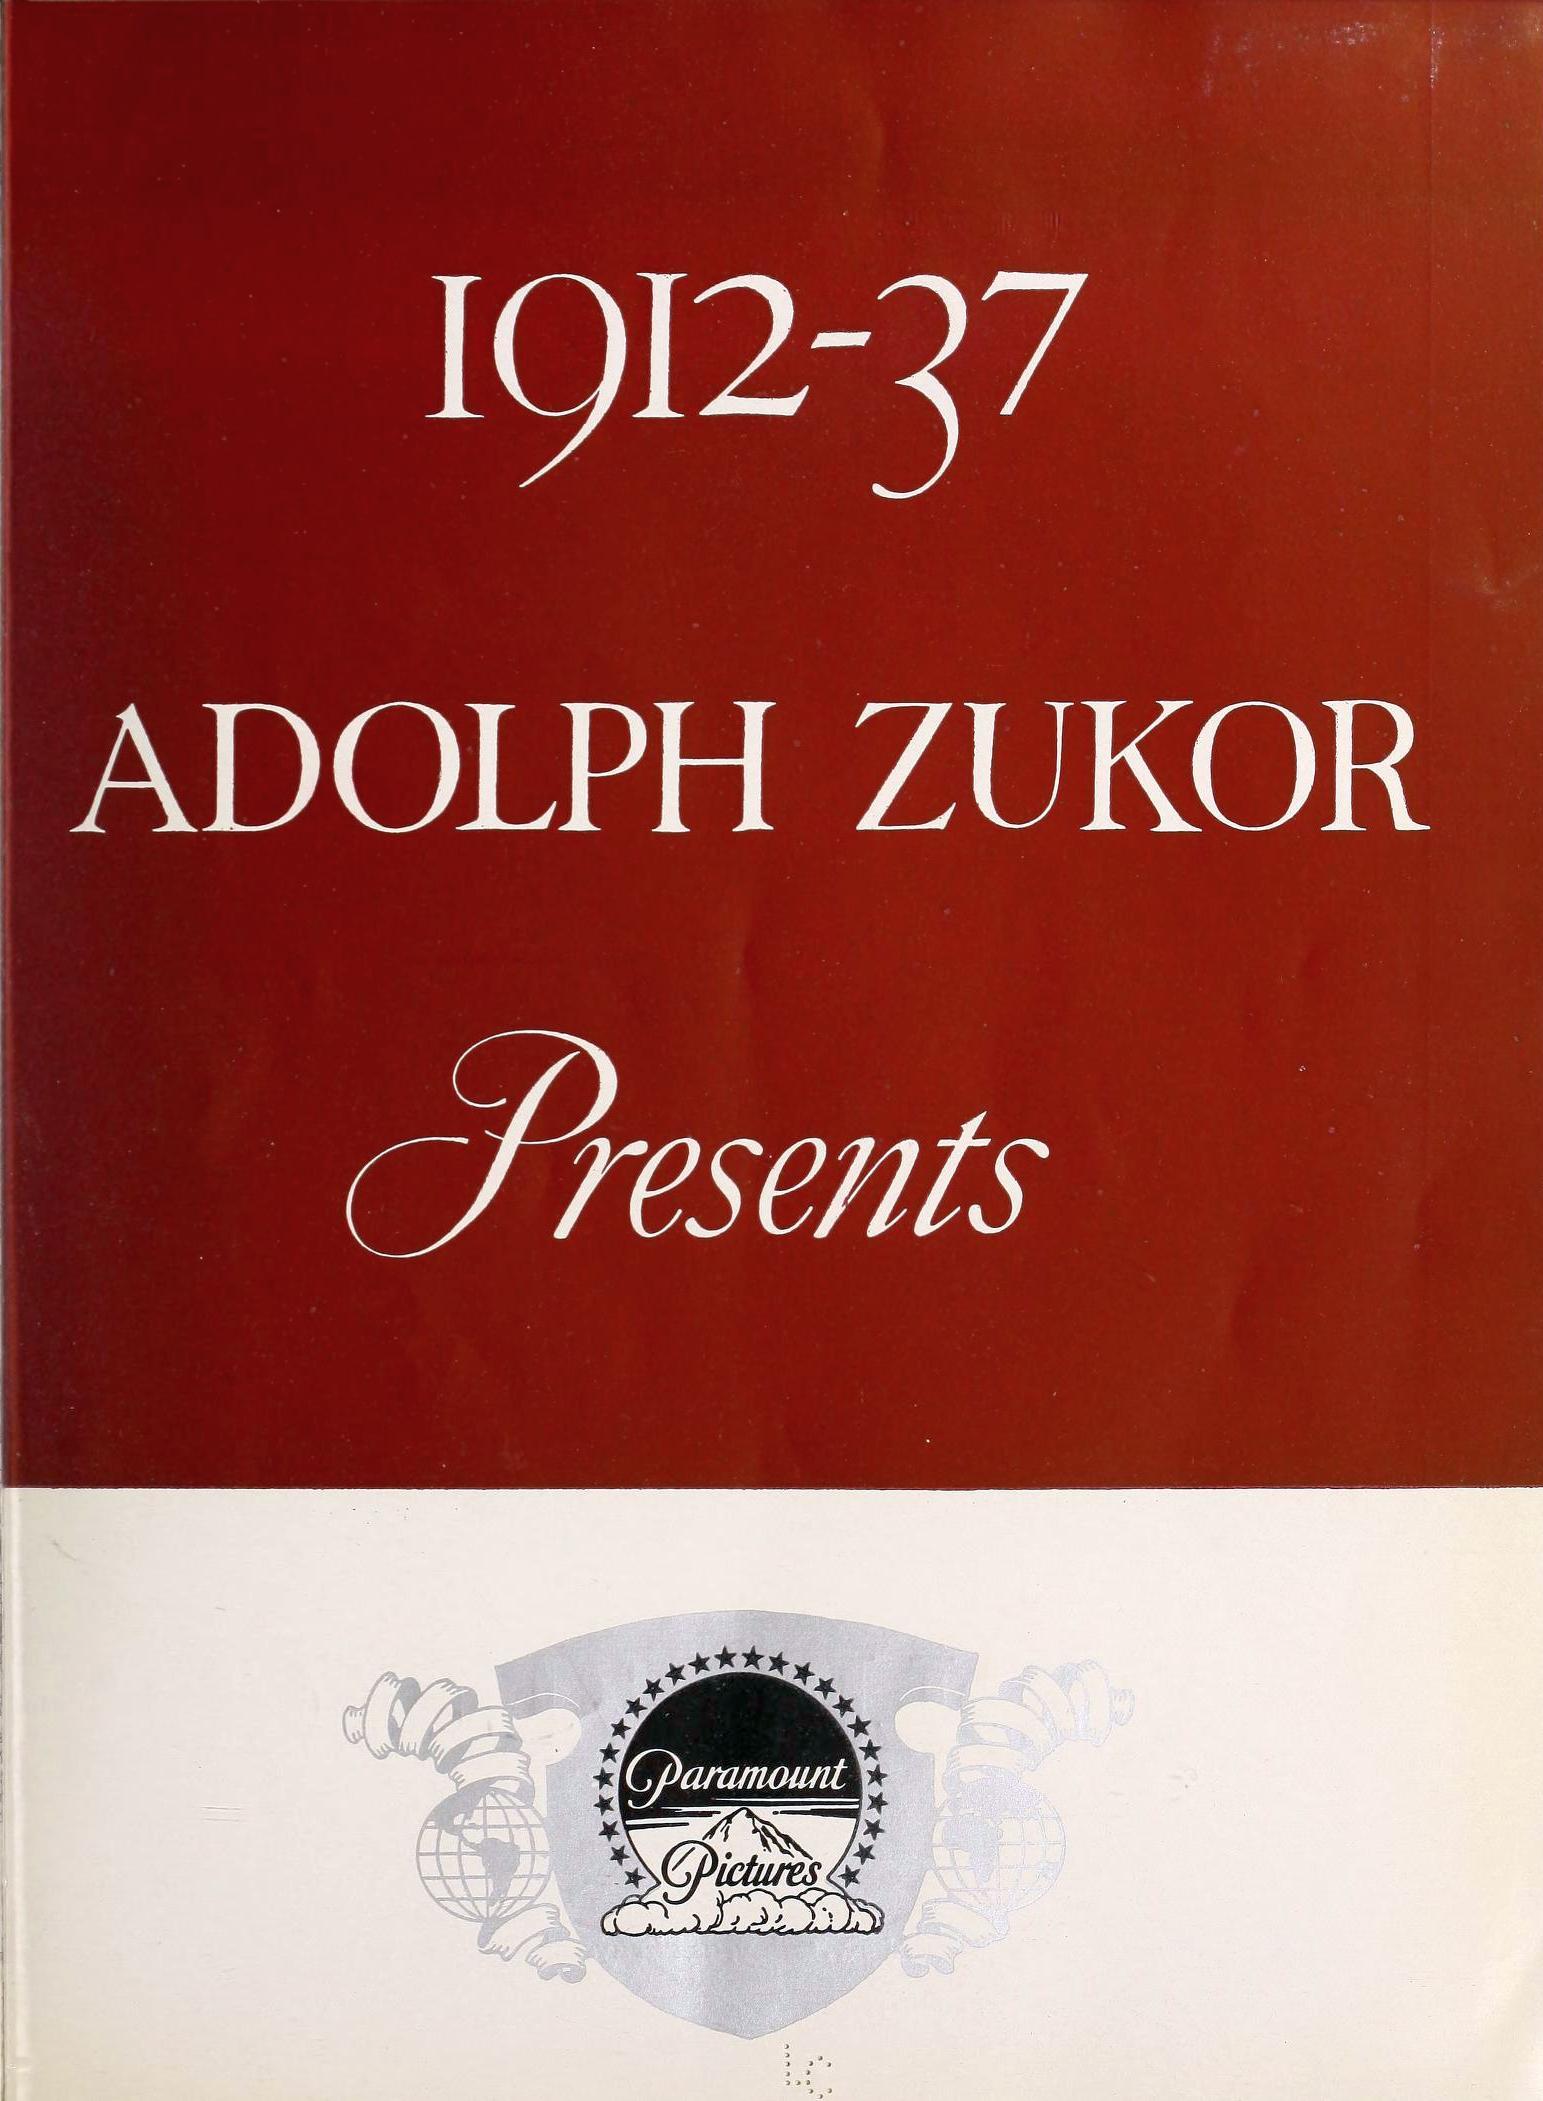 adolph zukor 010537 film daily 00a